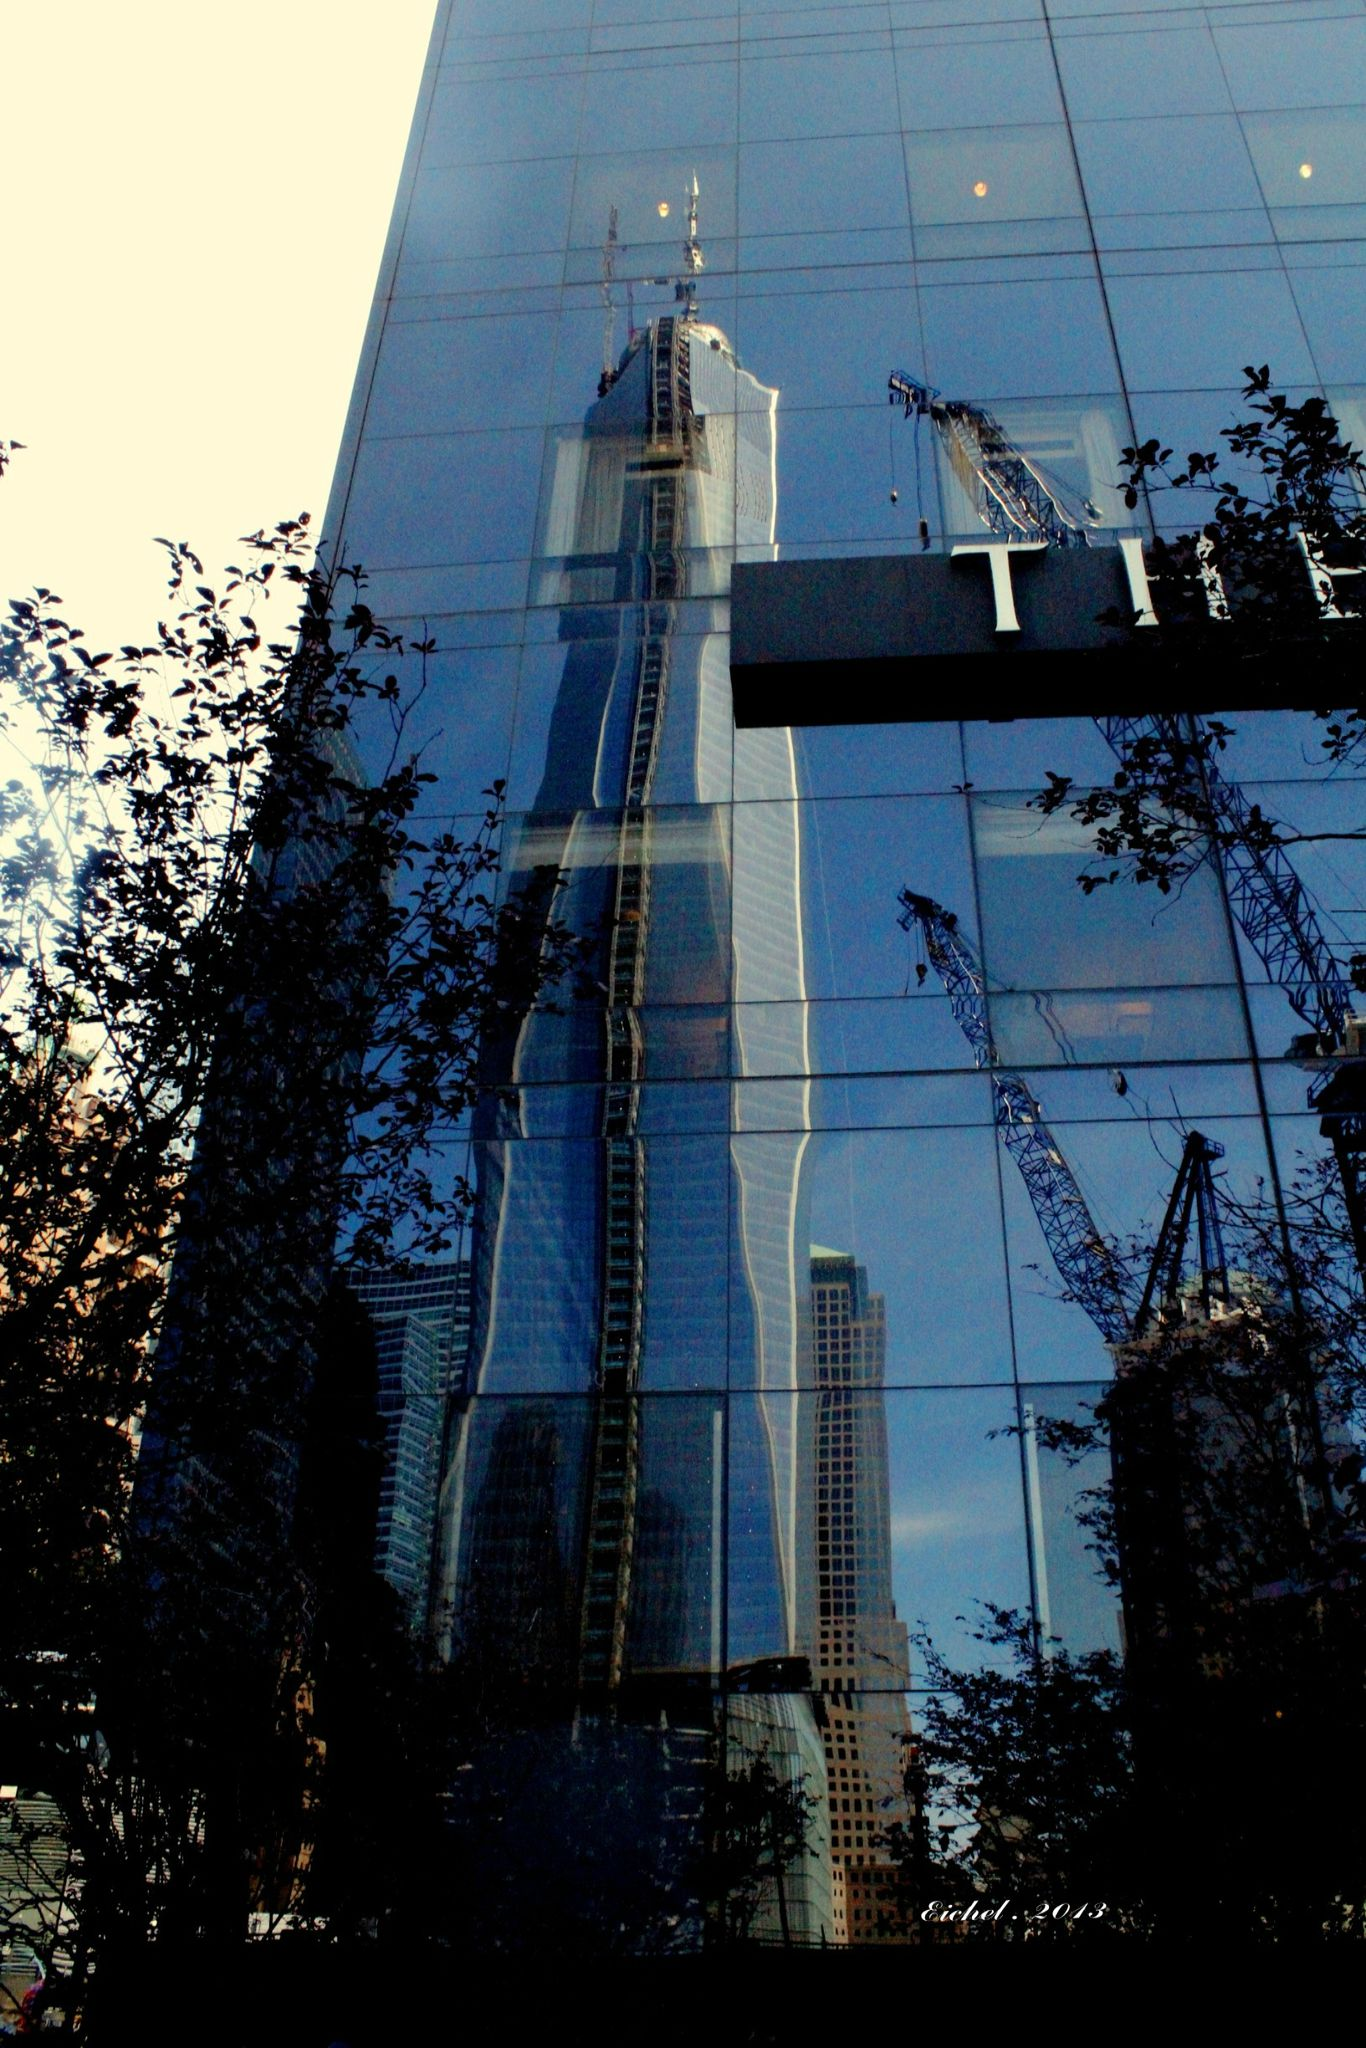 New-York (Mémorial du 11 septembre 2001, imaginer l'avenir)